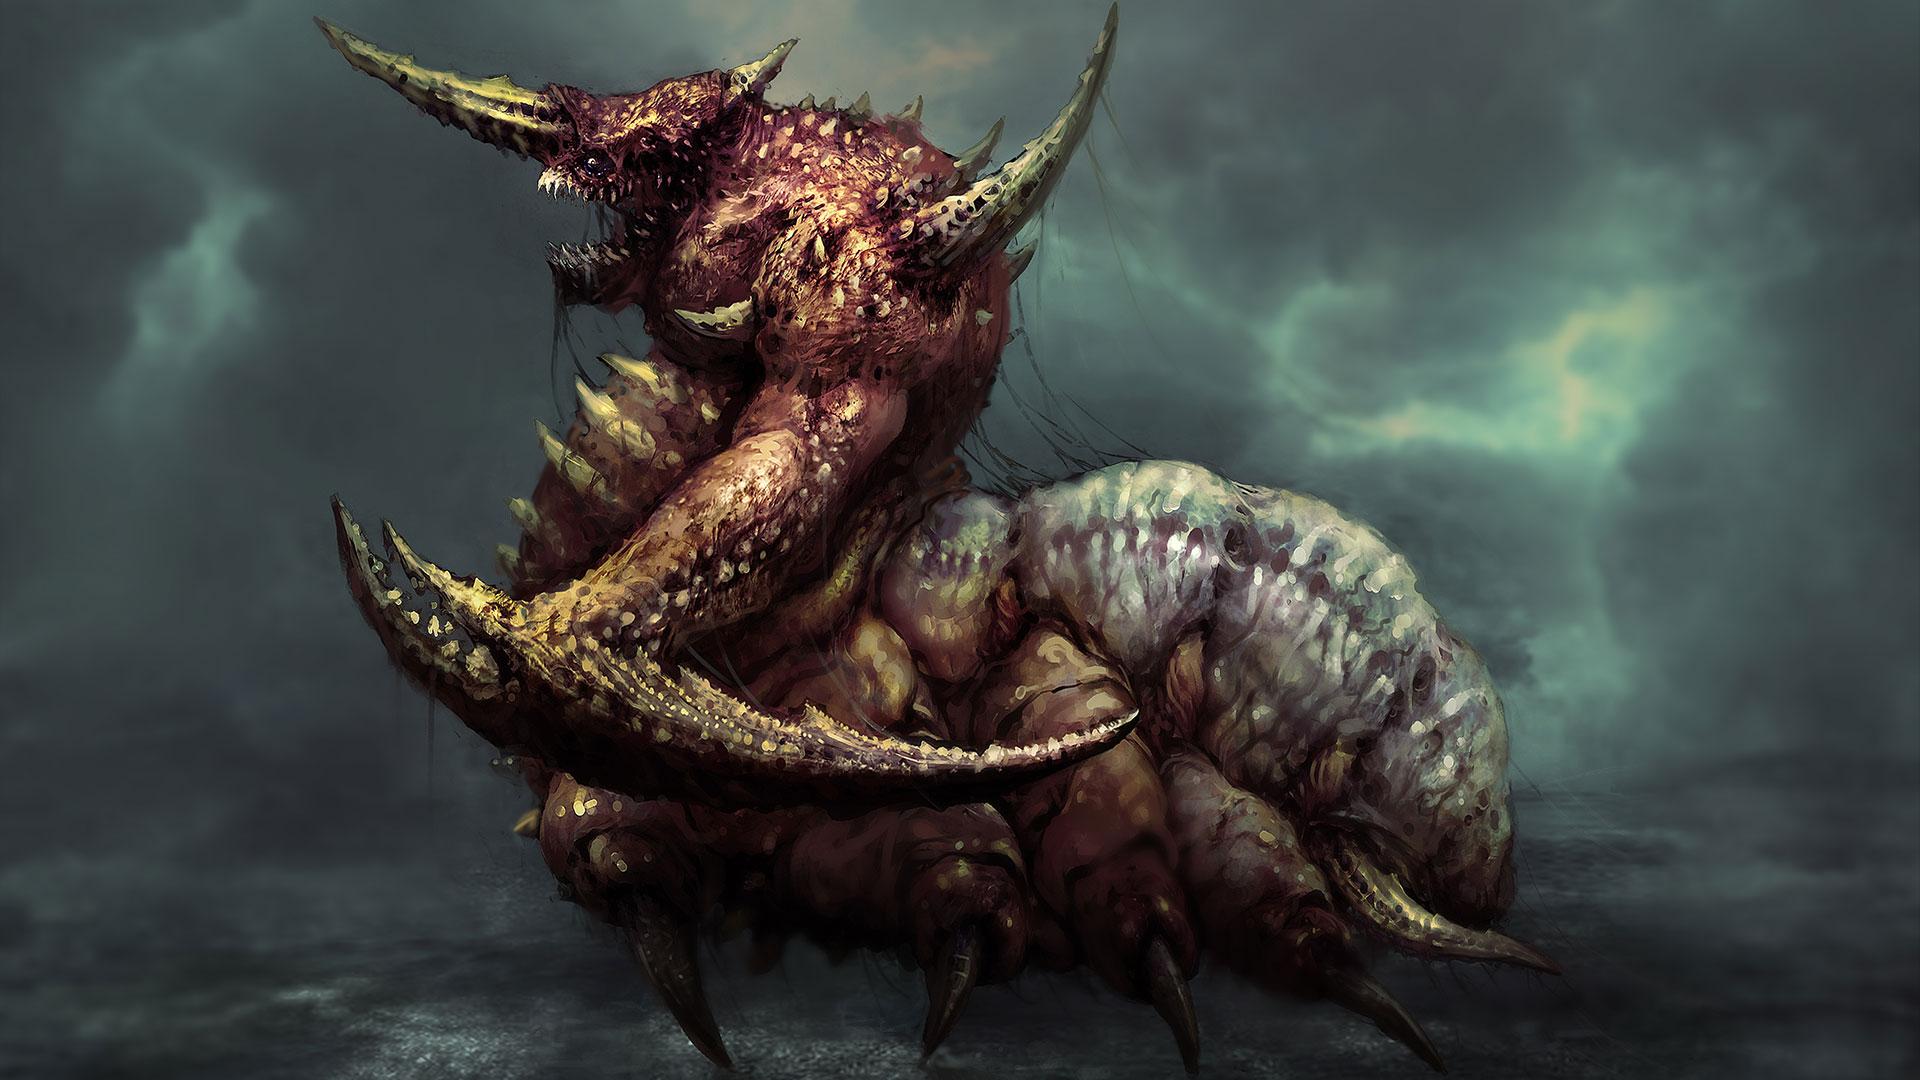 Diablo 4 Wallpapers - HD Desktop & Mobile Backgrounds ...